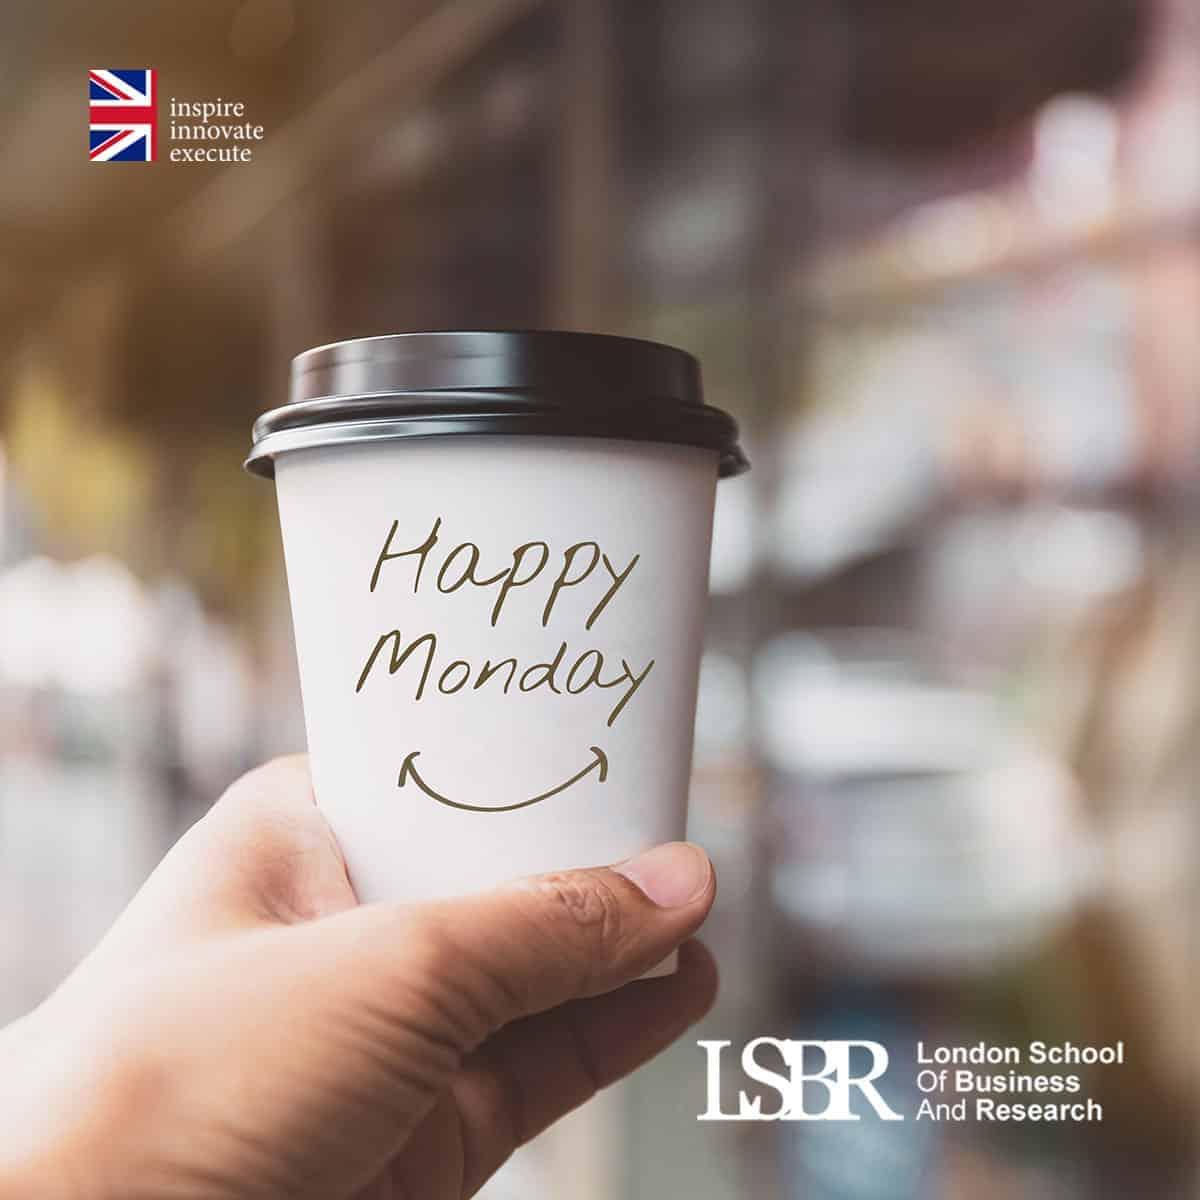 LSBR Motivational Quote - Happy Monday